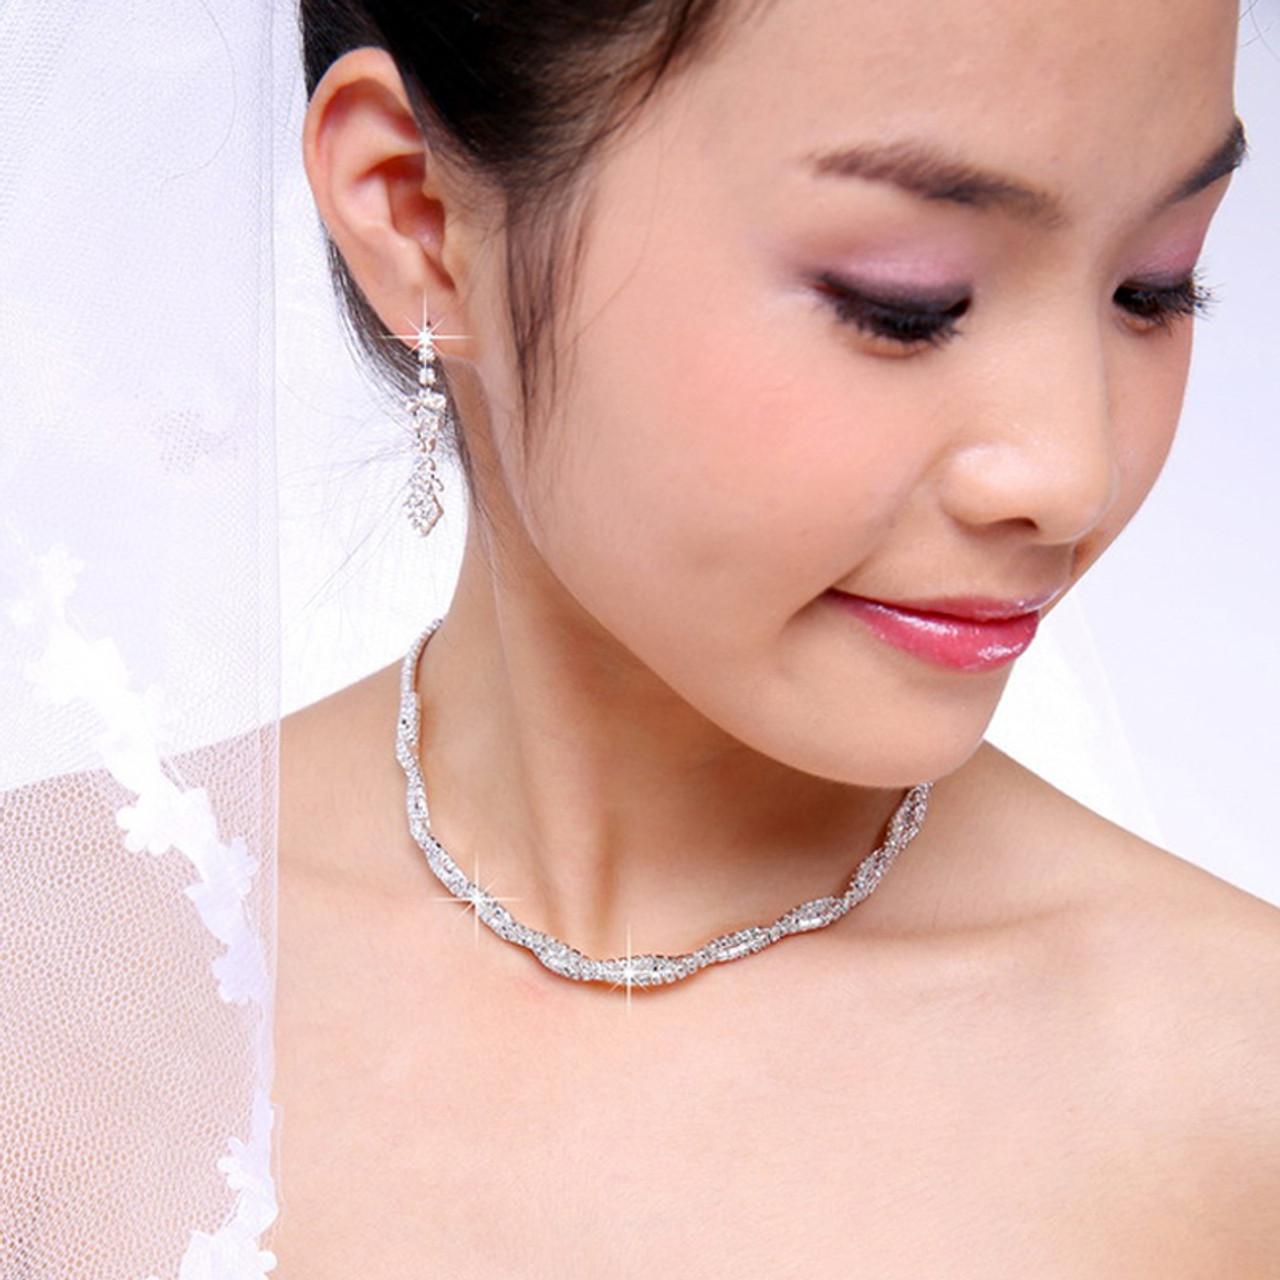 Crystal Rhinestone Pendant Choker Necklace Earrings Set Wedding Bridal Jewelry